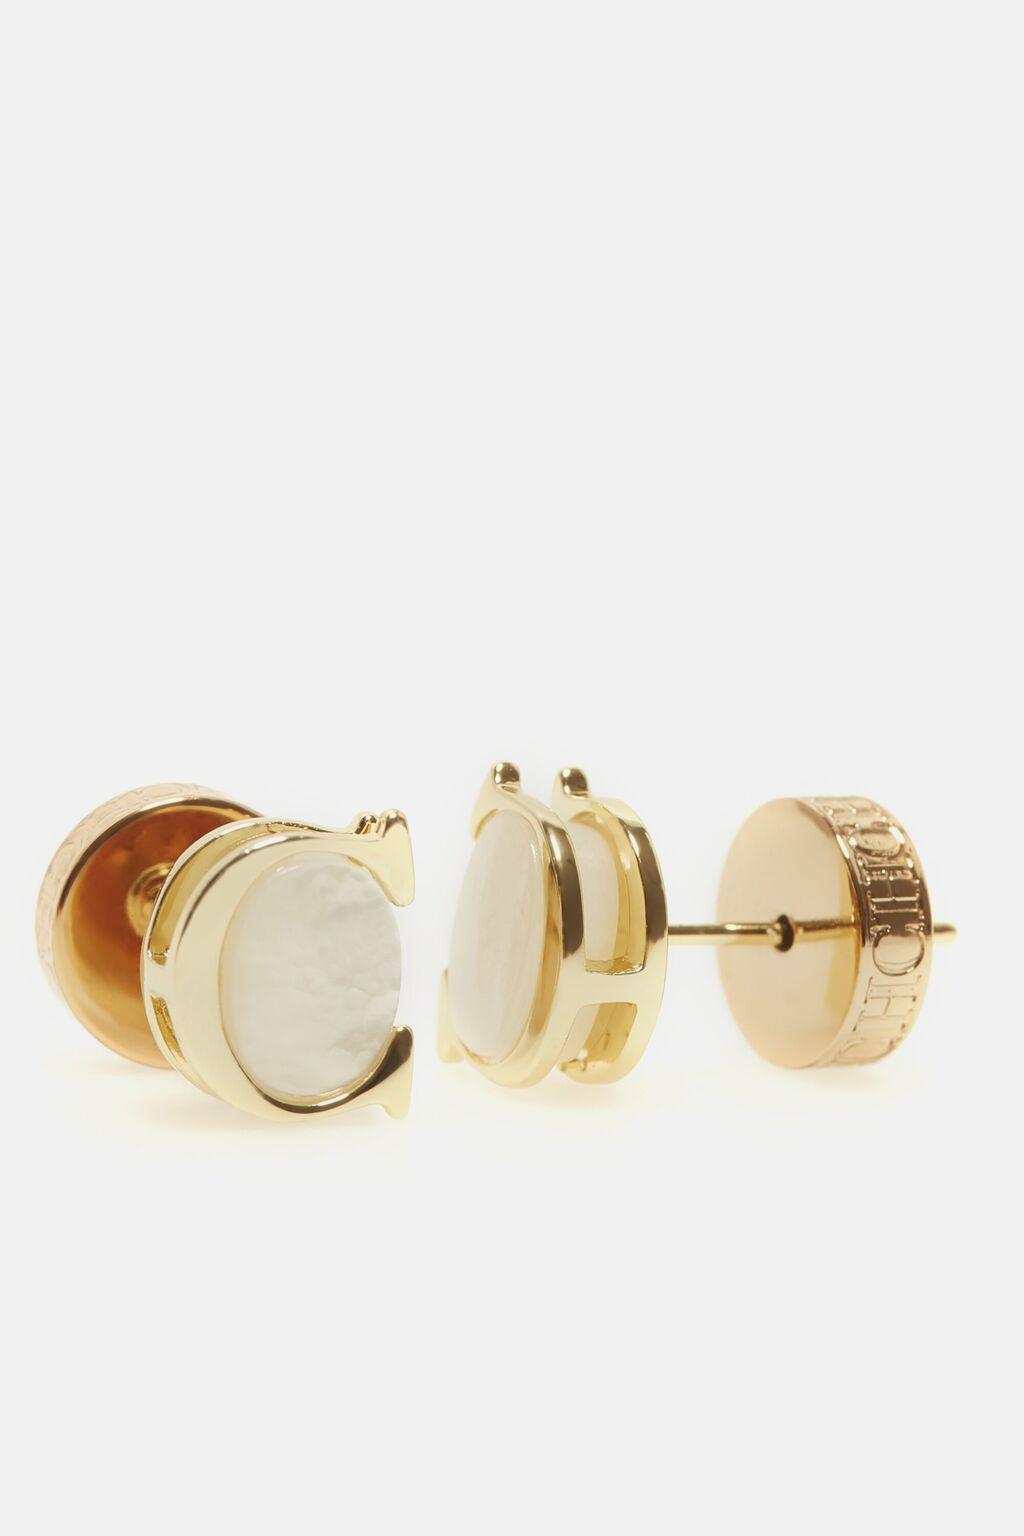 Scala earrings